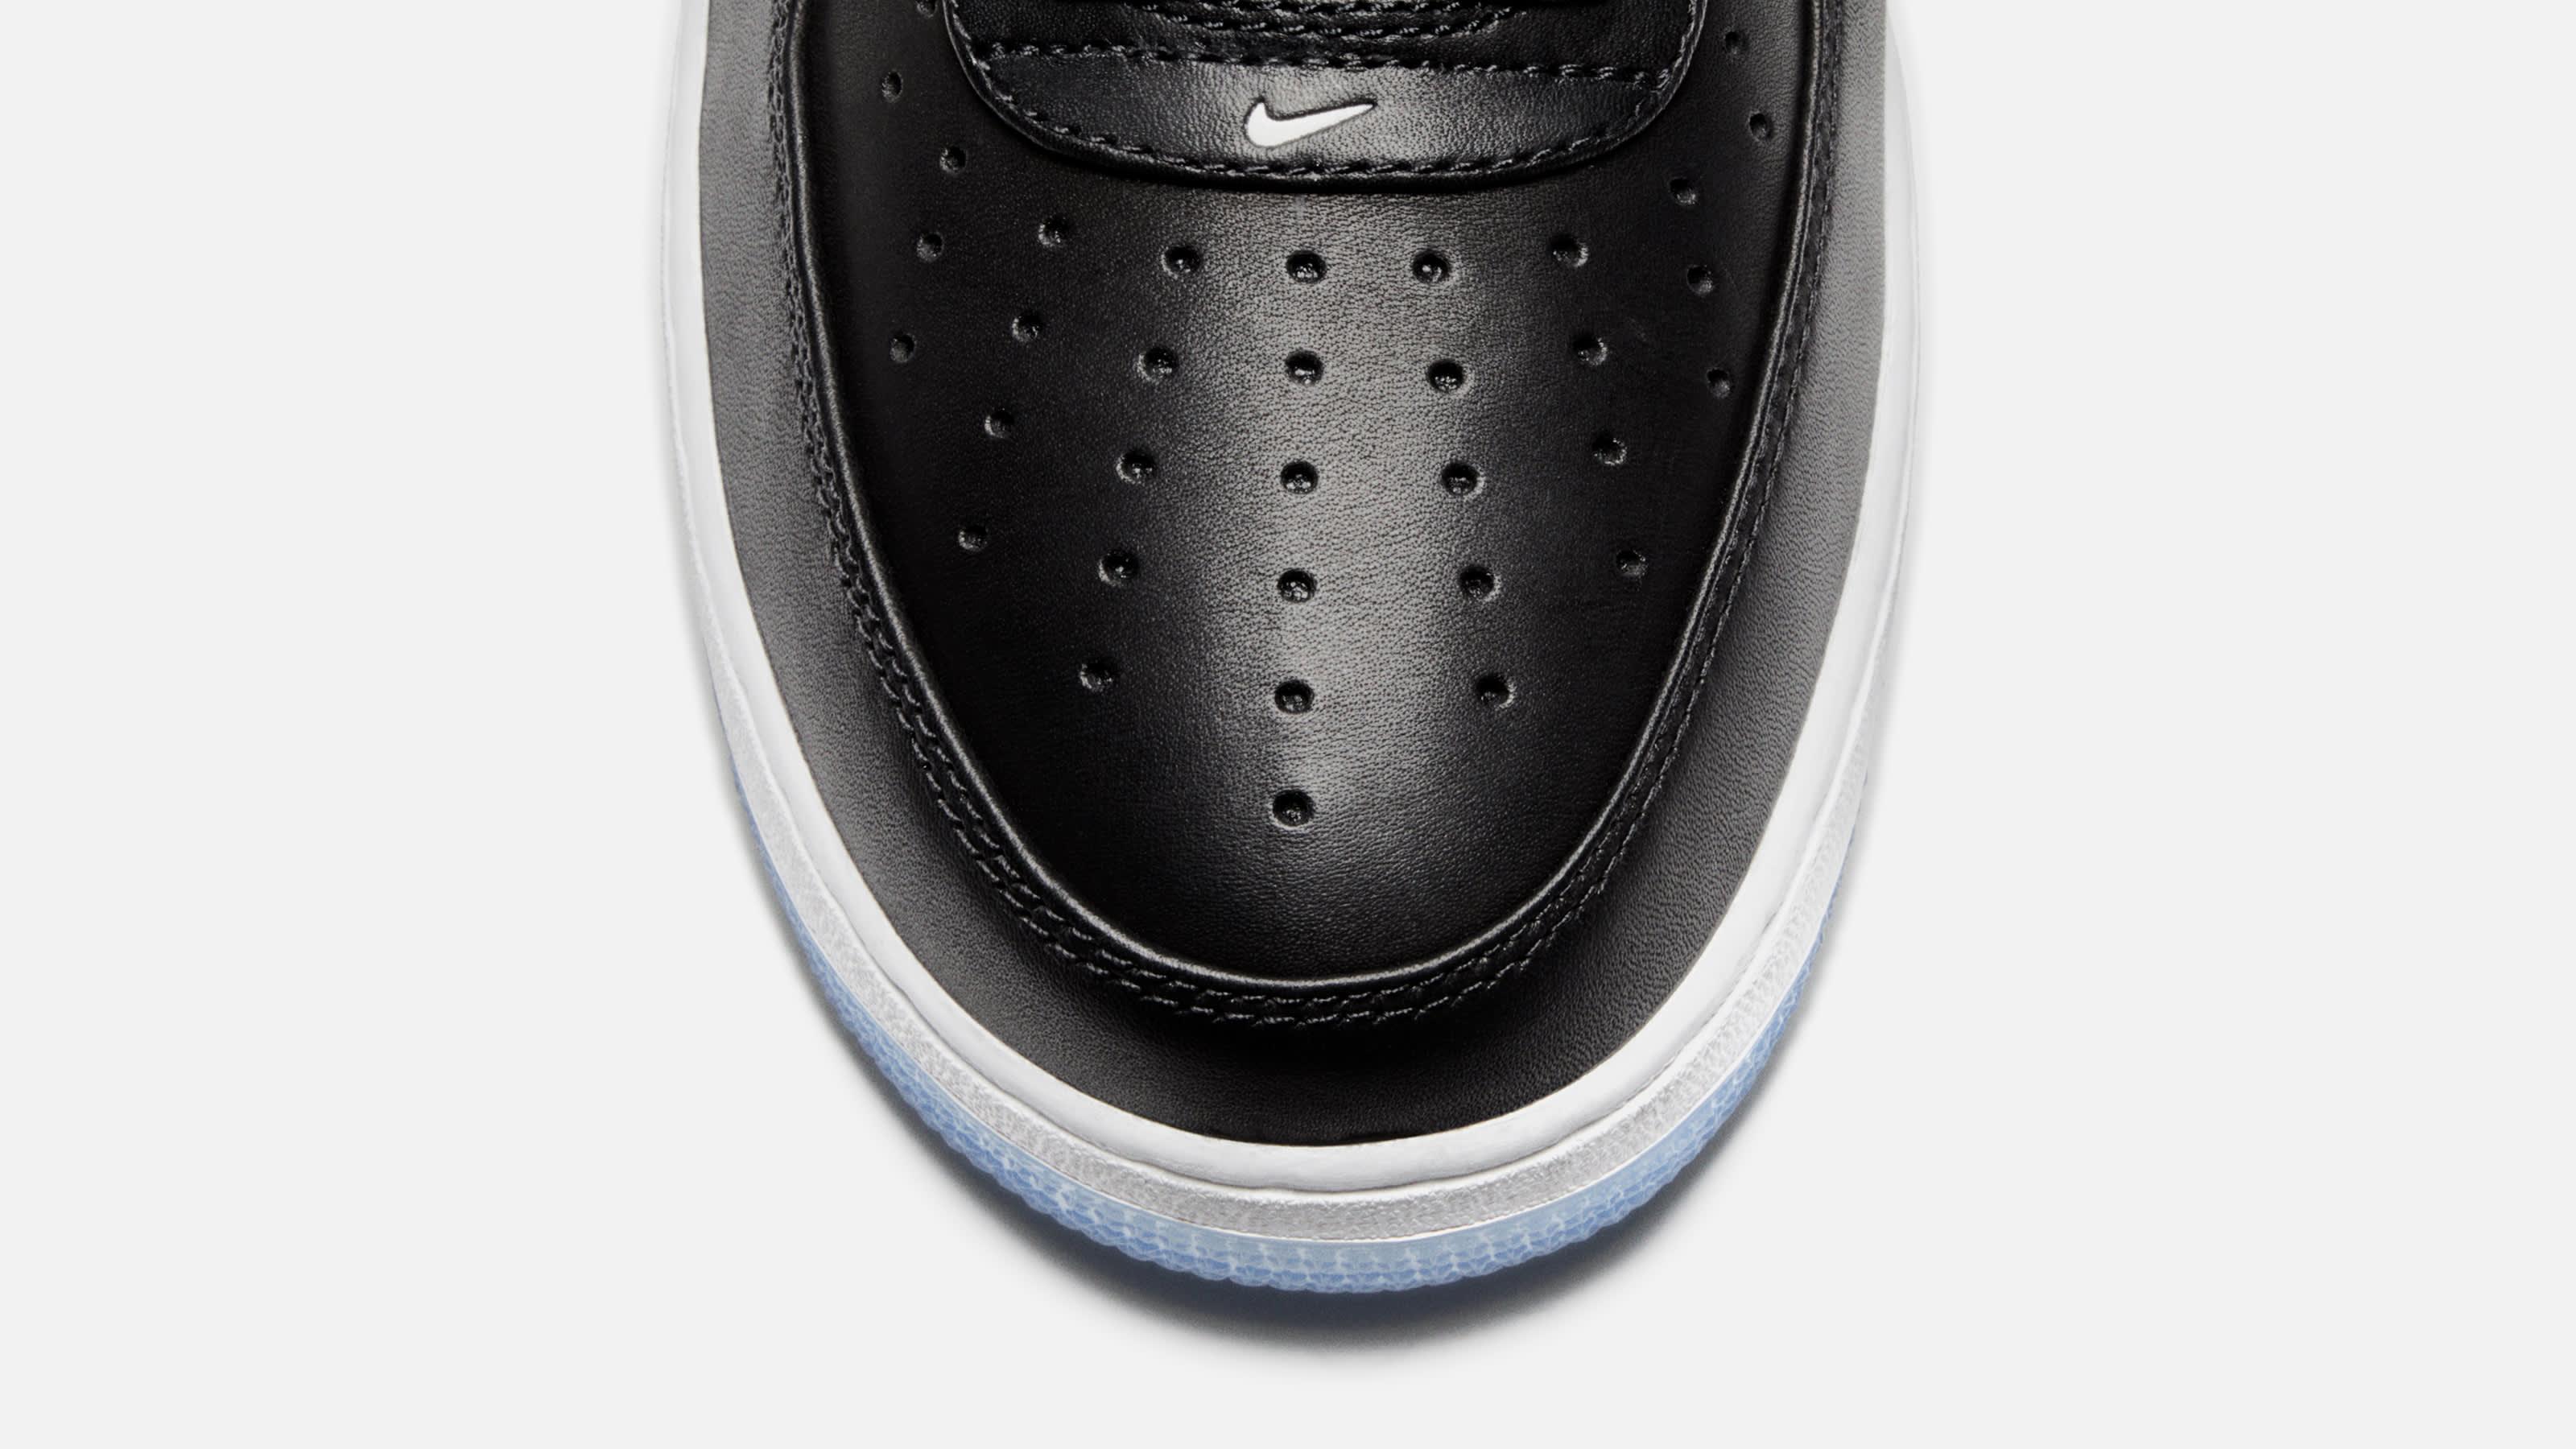 Colin Kaepernick x Nike Air Force 1 Low Release Date CQ0493-001 Toe